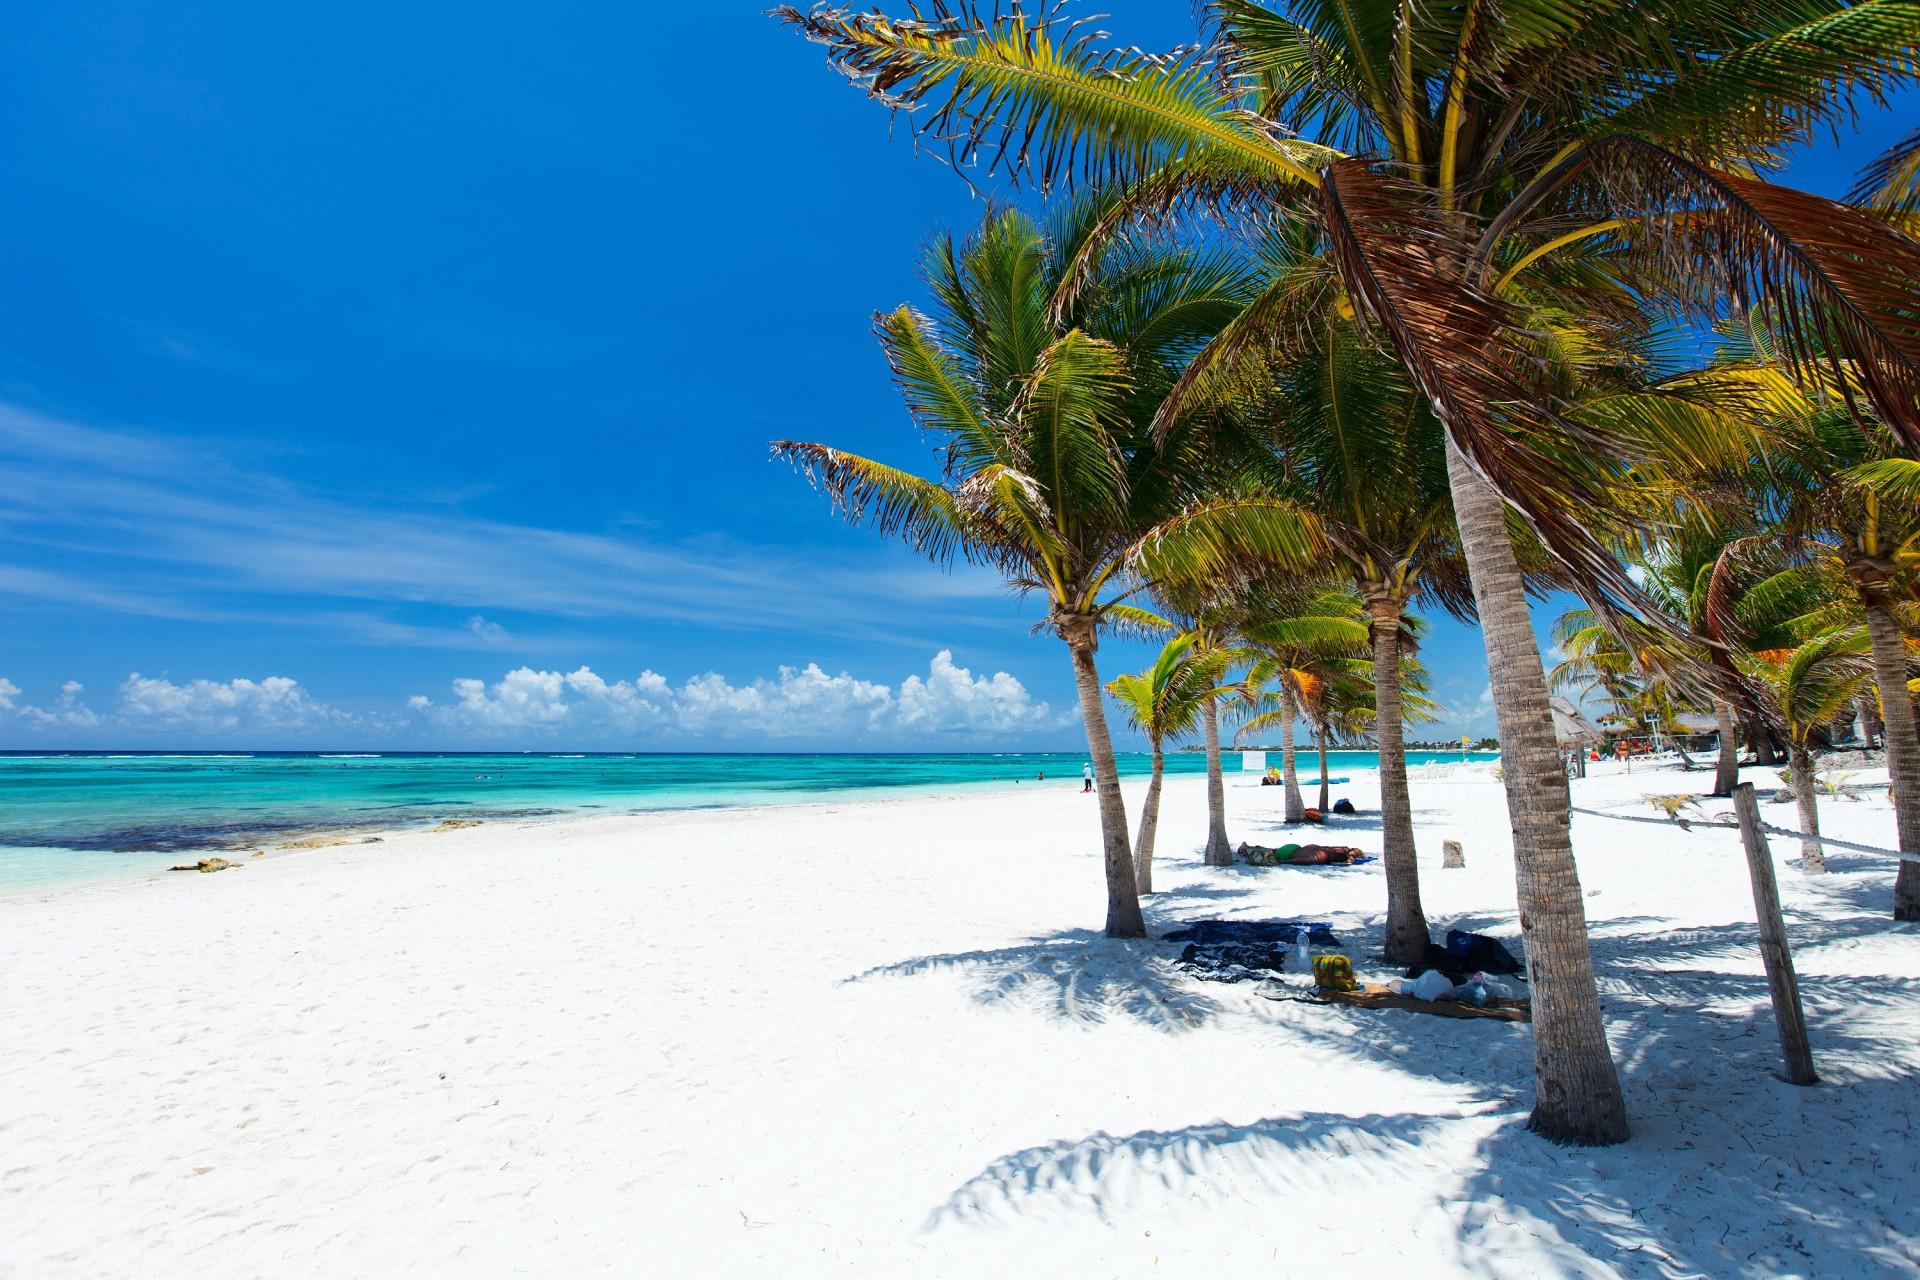 Oferta Speciala Relax Cancun